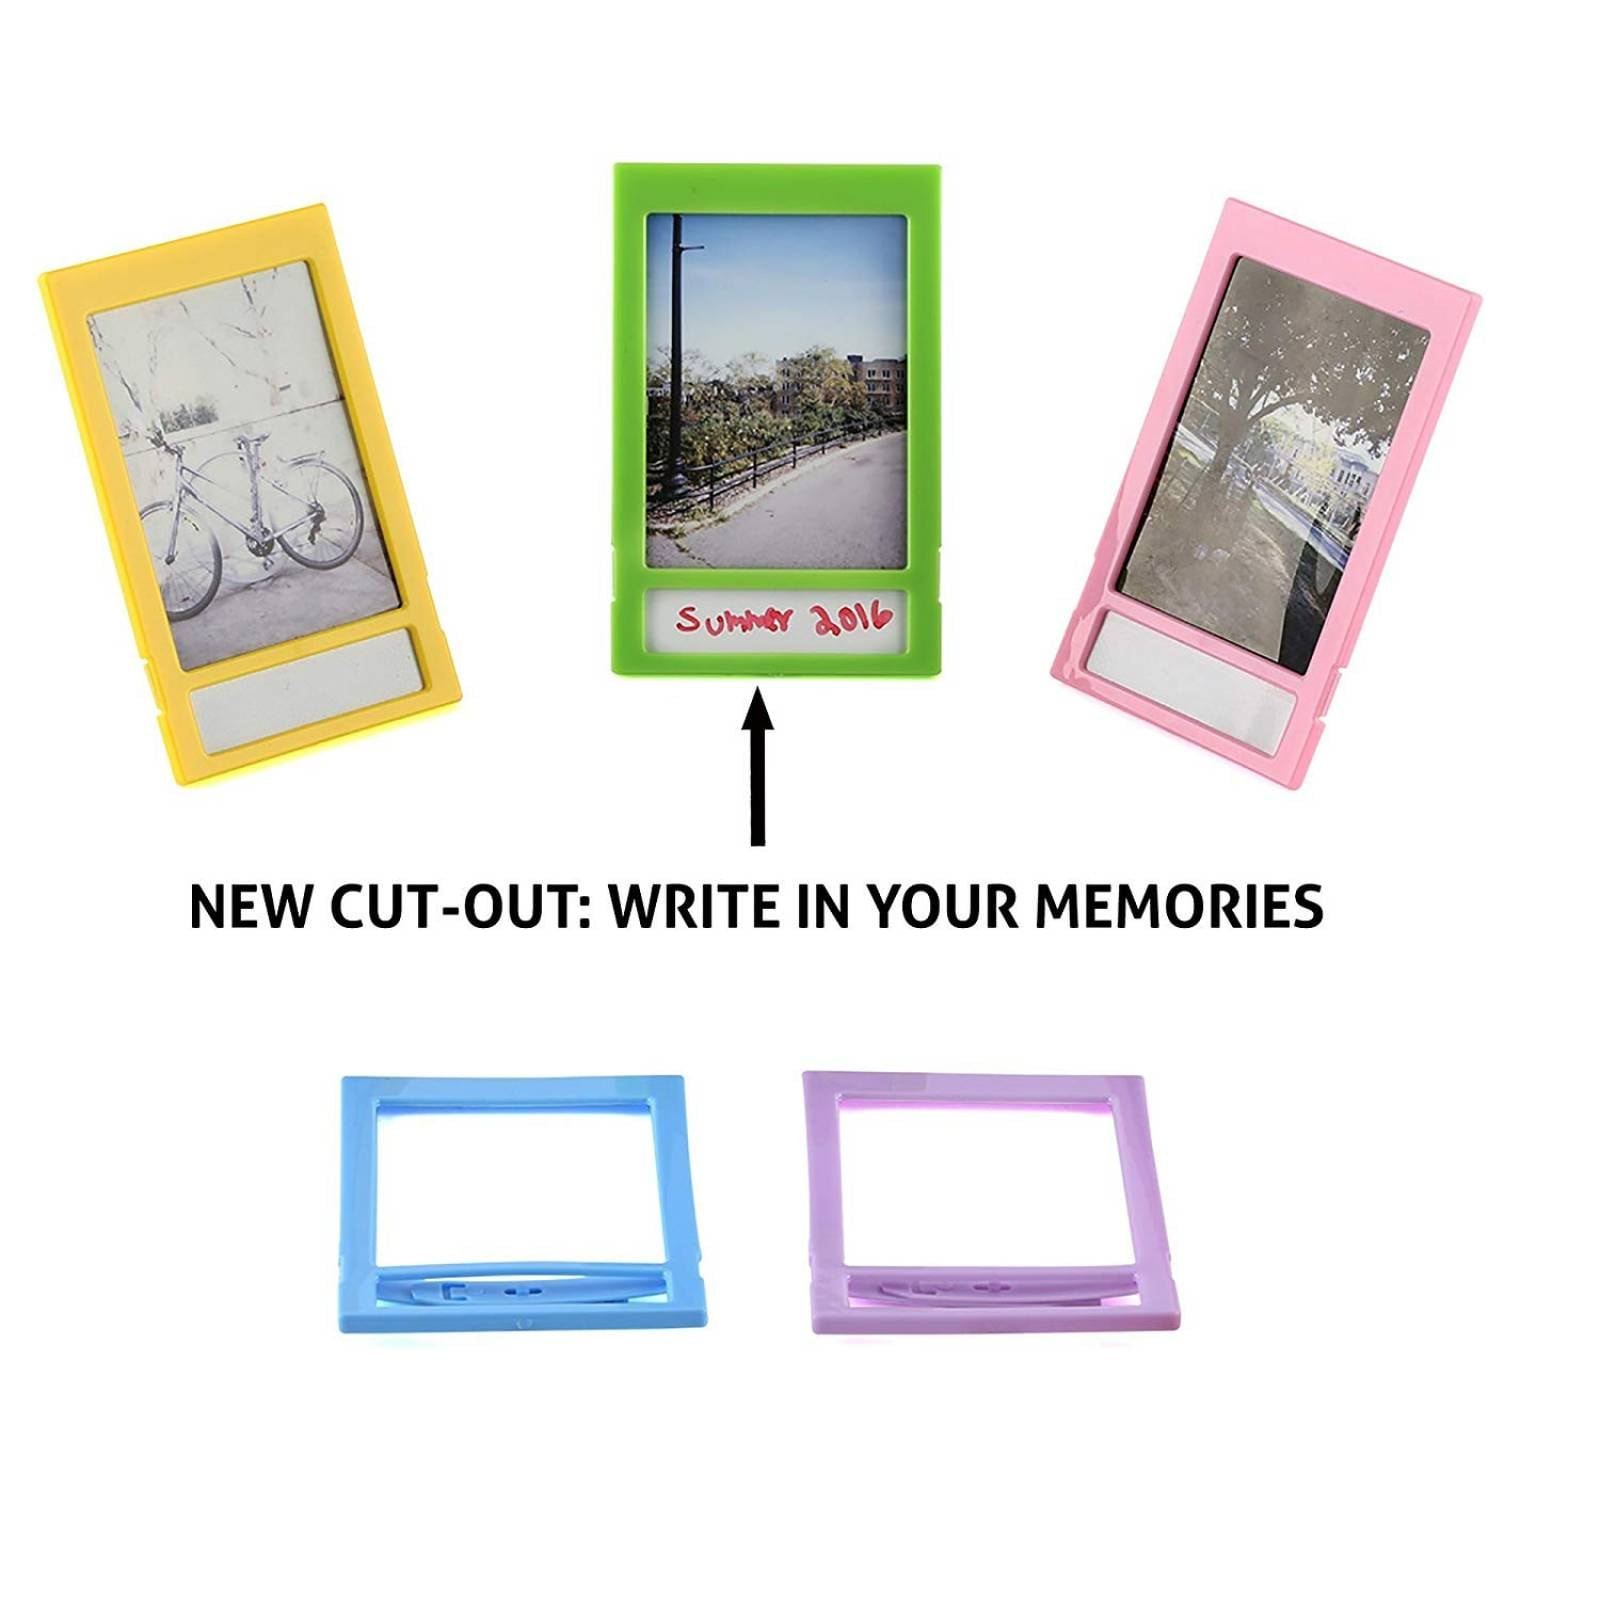 Kit Accesorios Fujifilm Instax Mini Shutter Con 11 Piezas